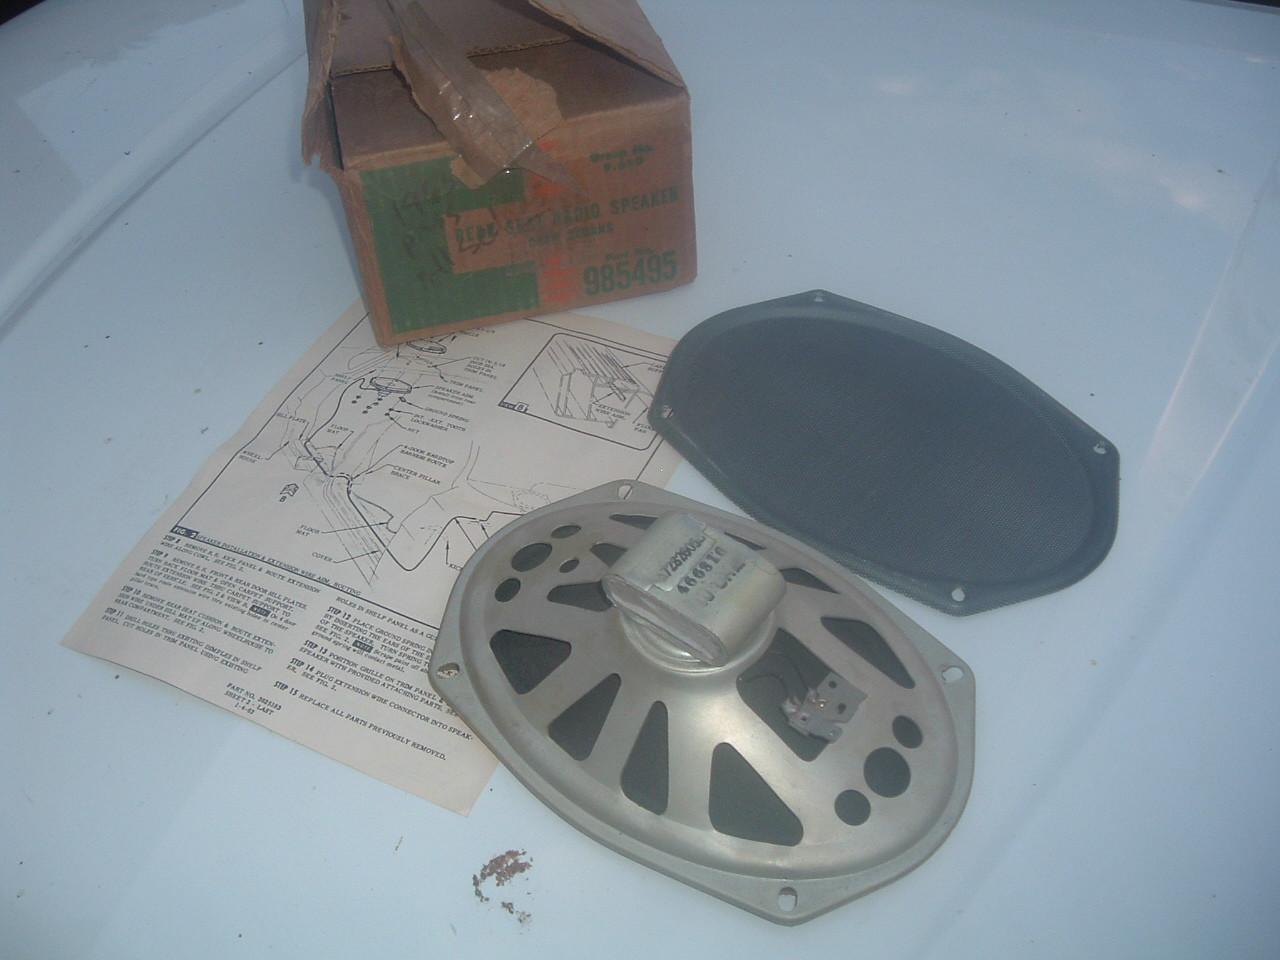 1963 chevrolet impala belair biscayne rear radio speaker kit nos gm # 985495 (z 985495)